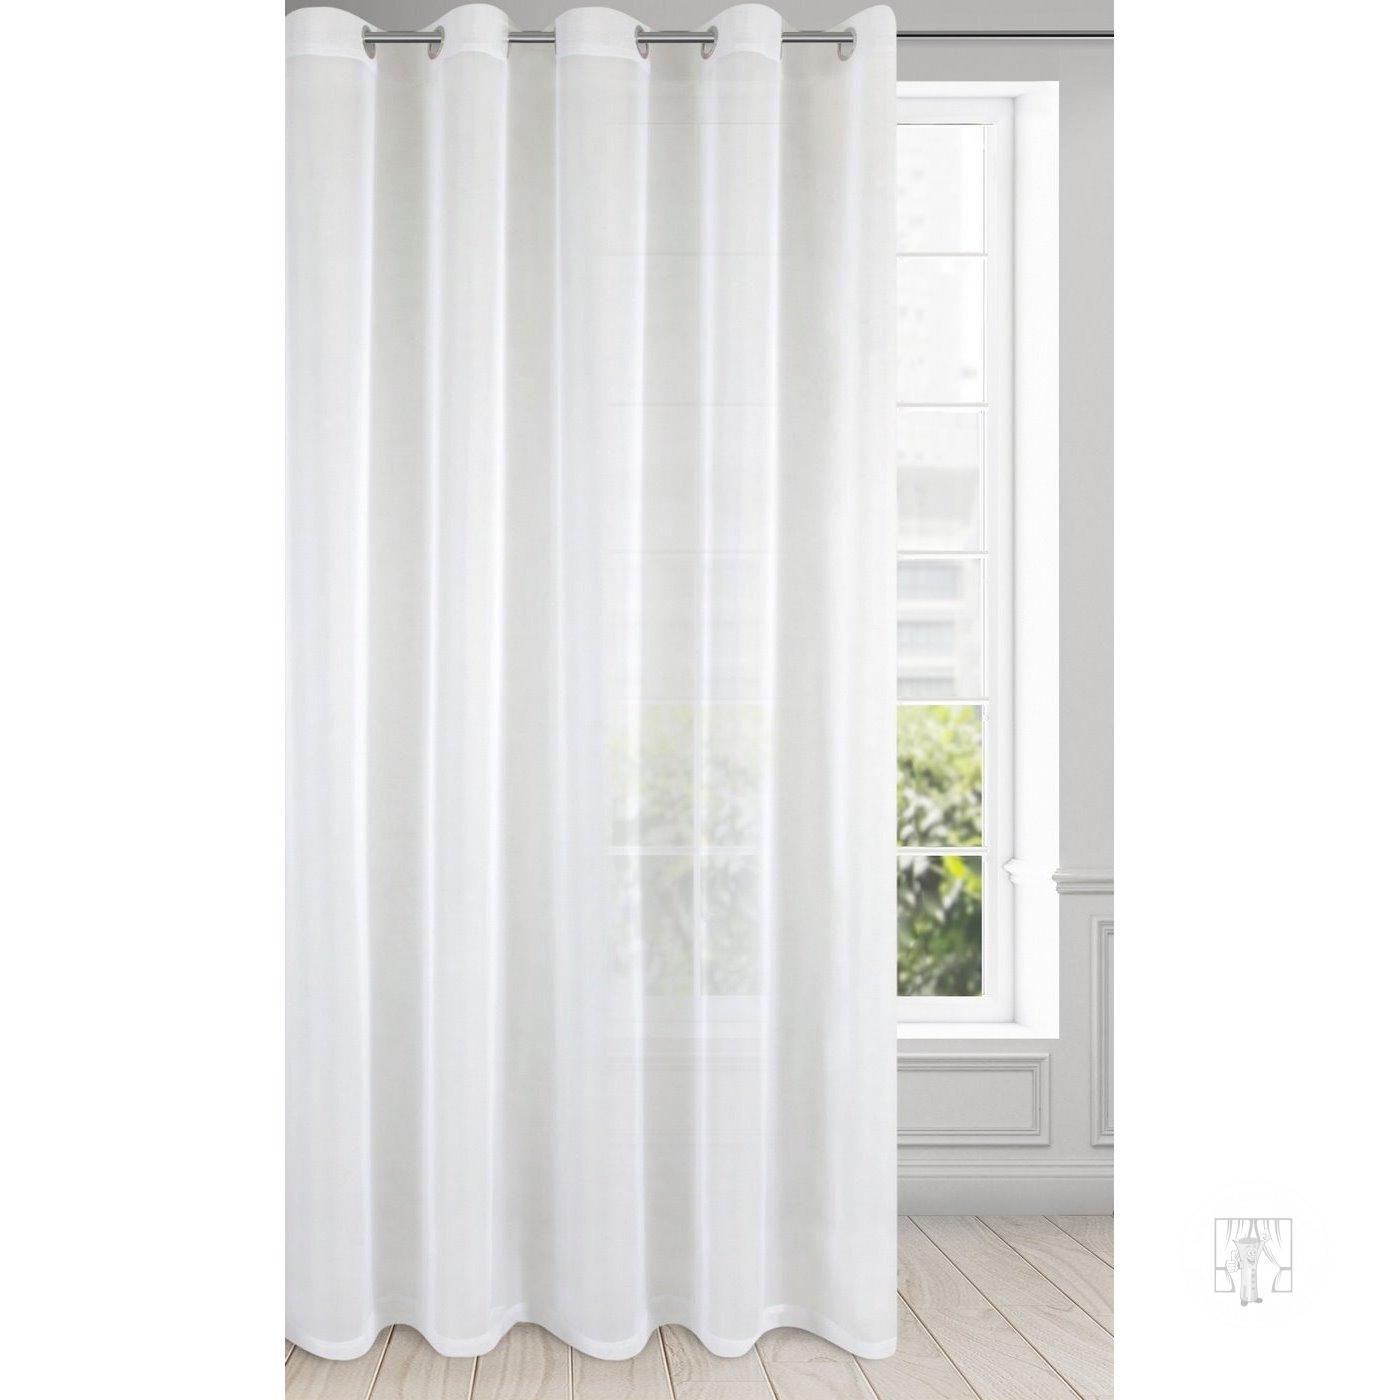 Záclona LUCY na krúžky biela 300x250cm